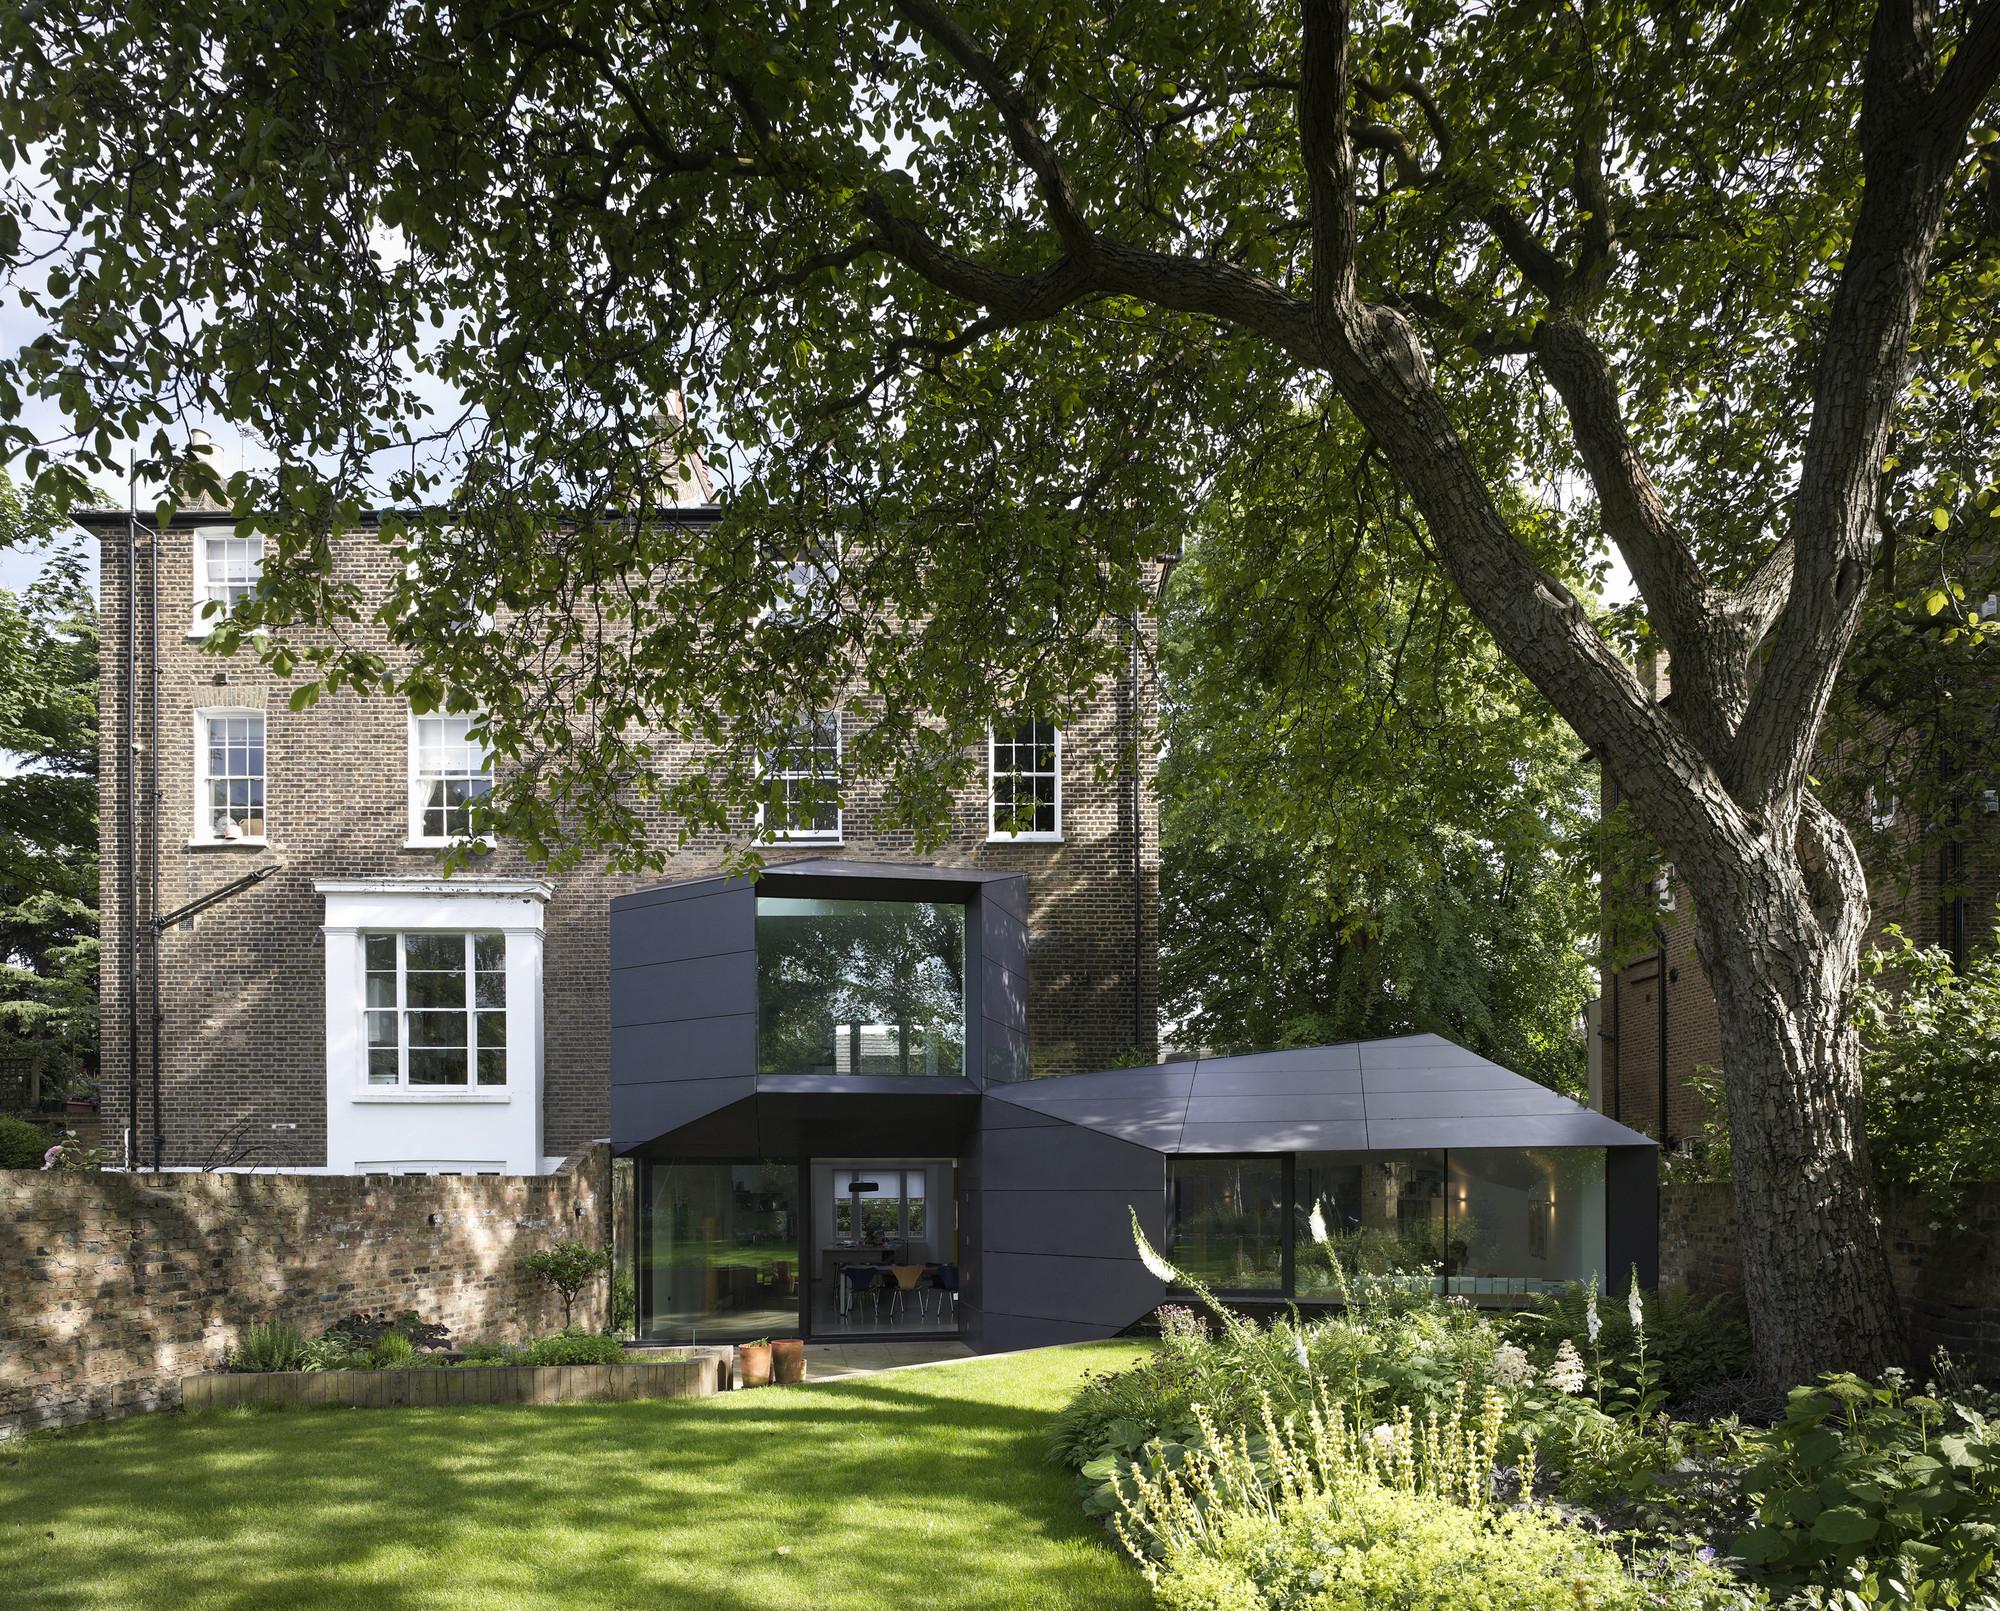 Lens House / Alison Brooks ArchitectsLens House / Alison Brooks Architects. Image © Paul Riddle